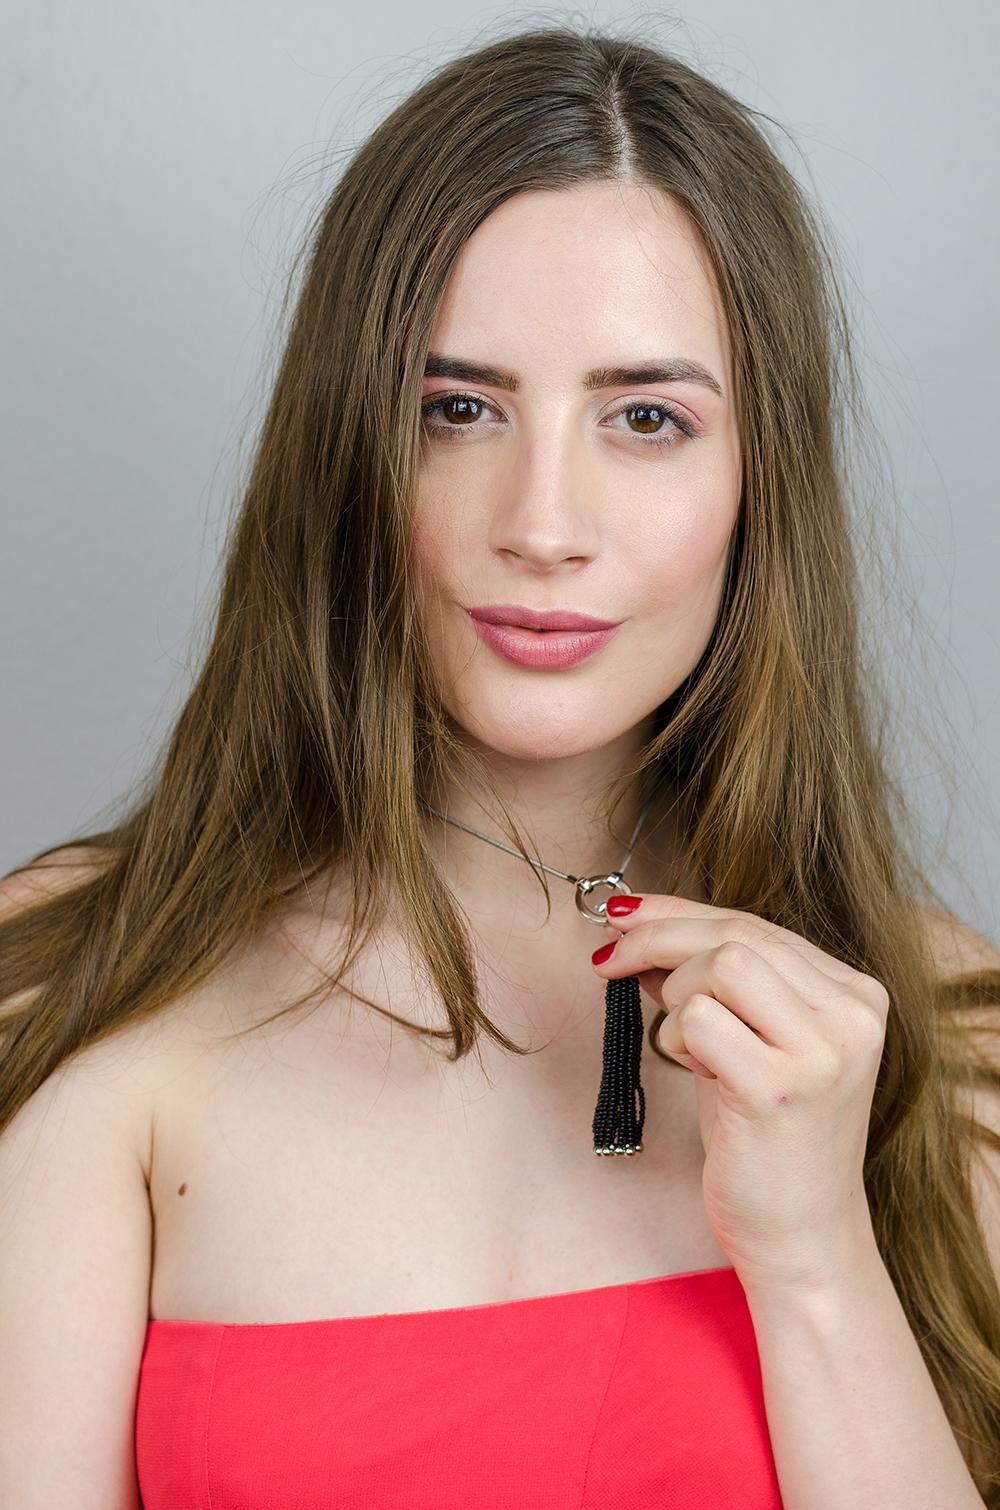 Beautybloggerin Andrea Funk von andysparkles trägt LEONARDO Schmuck